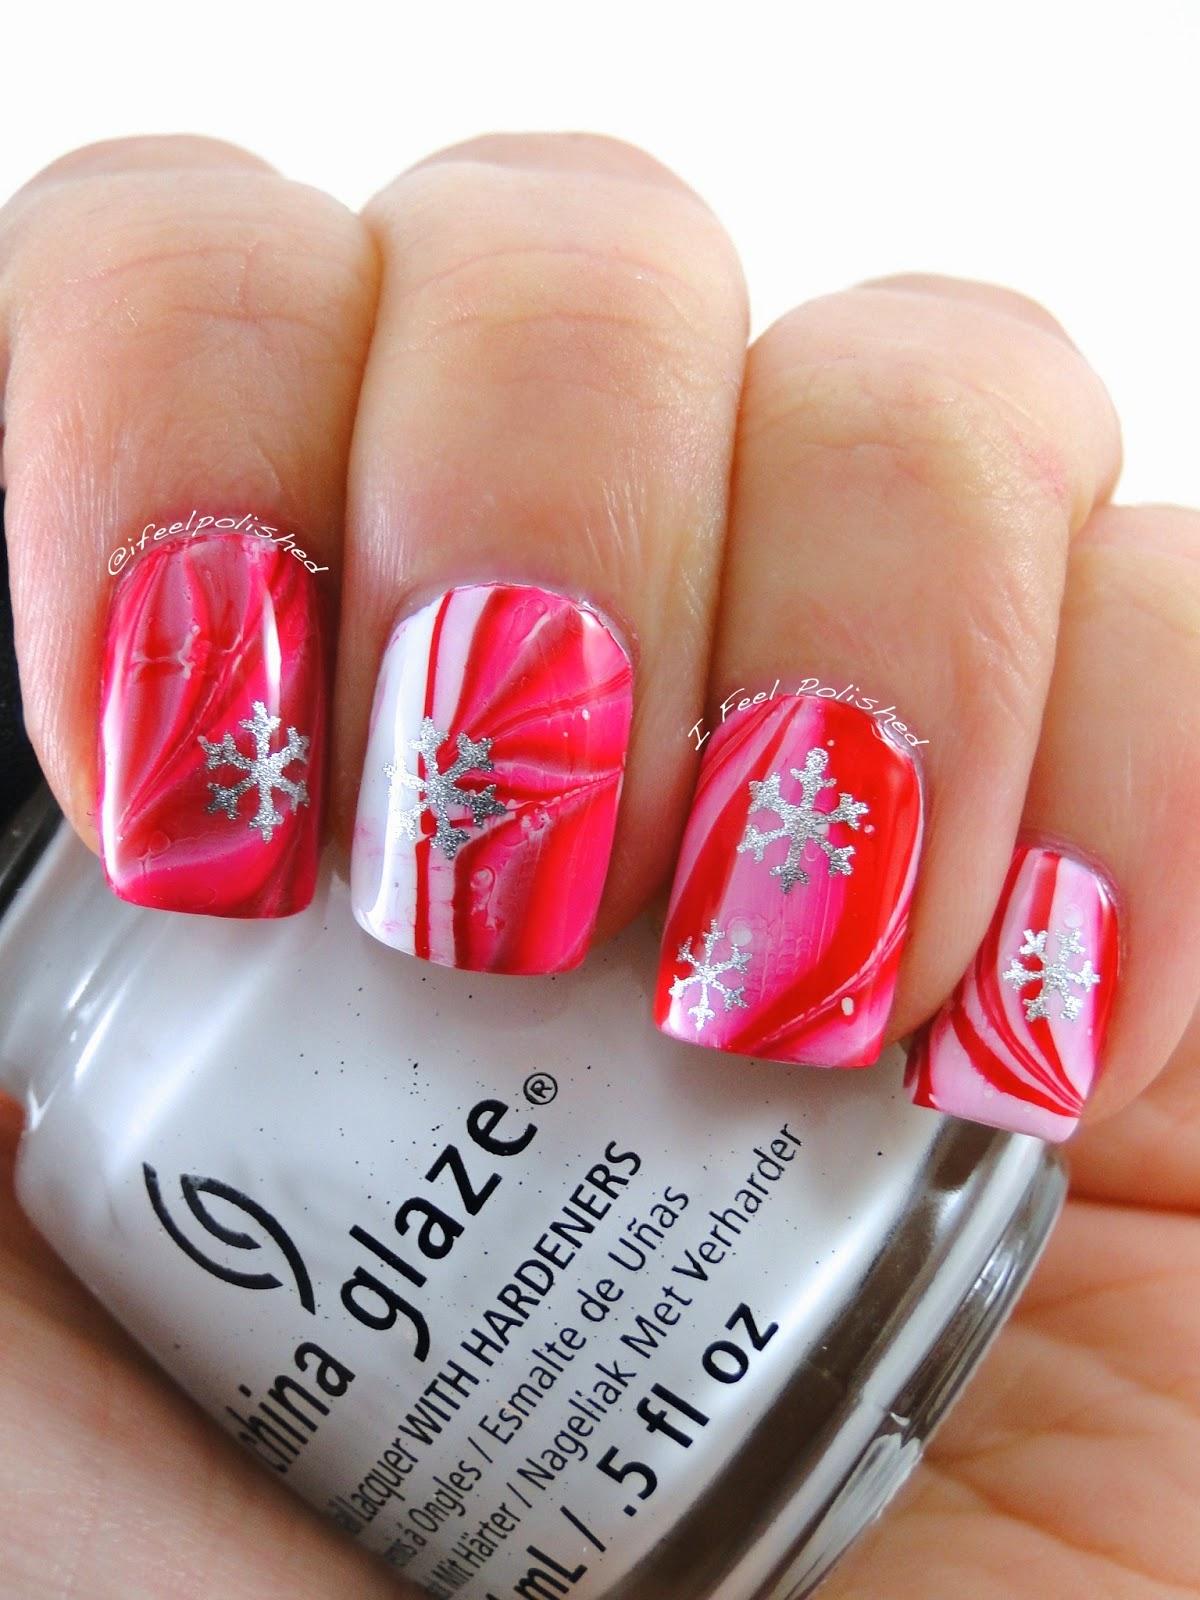 I Feel Polished Peppermint Winter Nails